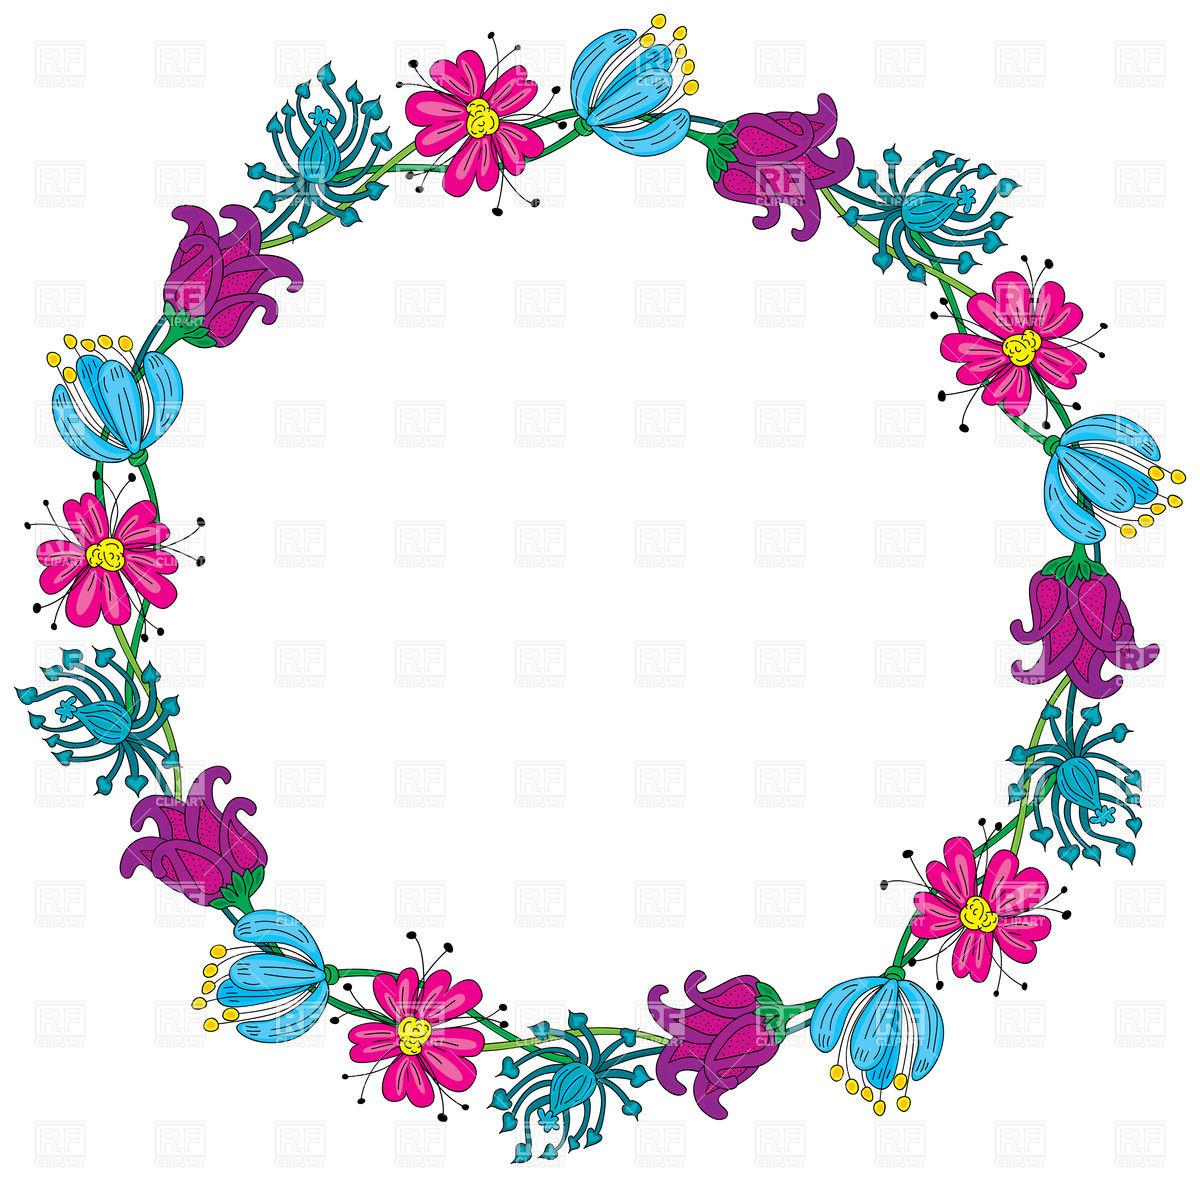 1200x1178 Cartoon Floral Wreath Vector Image Vector Artwork Of Design